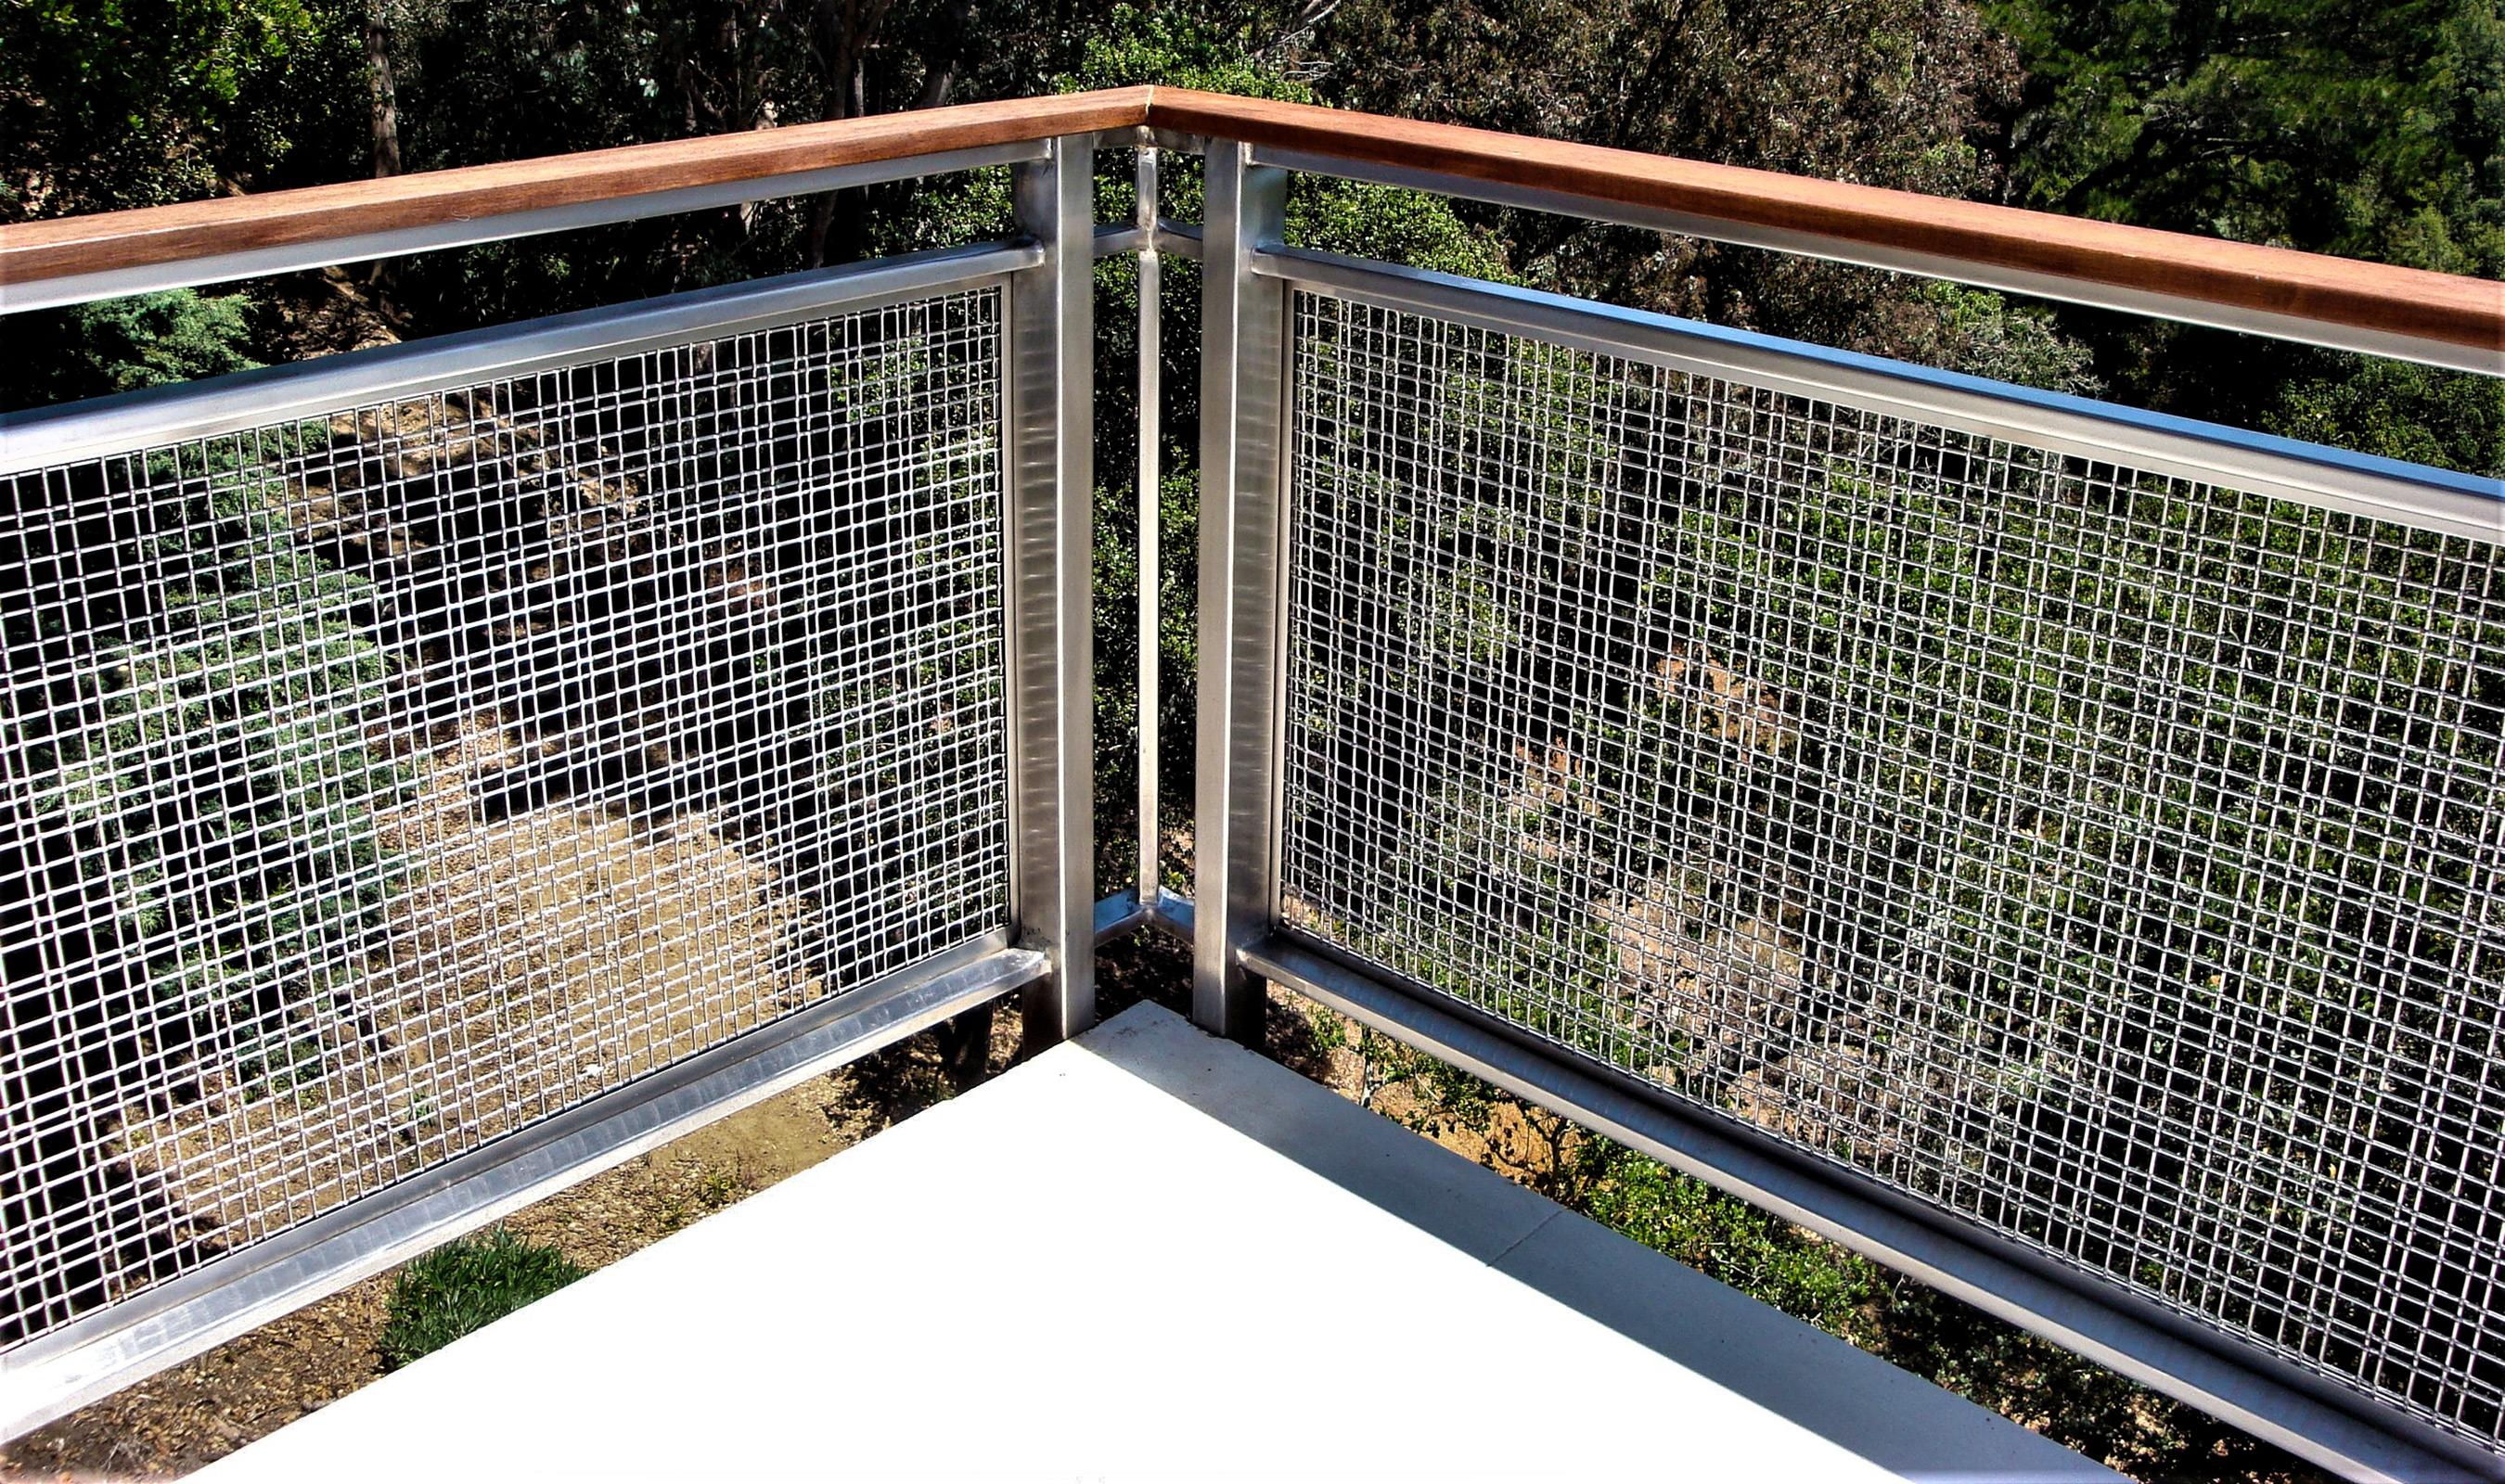 SJD-2 wire mesh infill panels